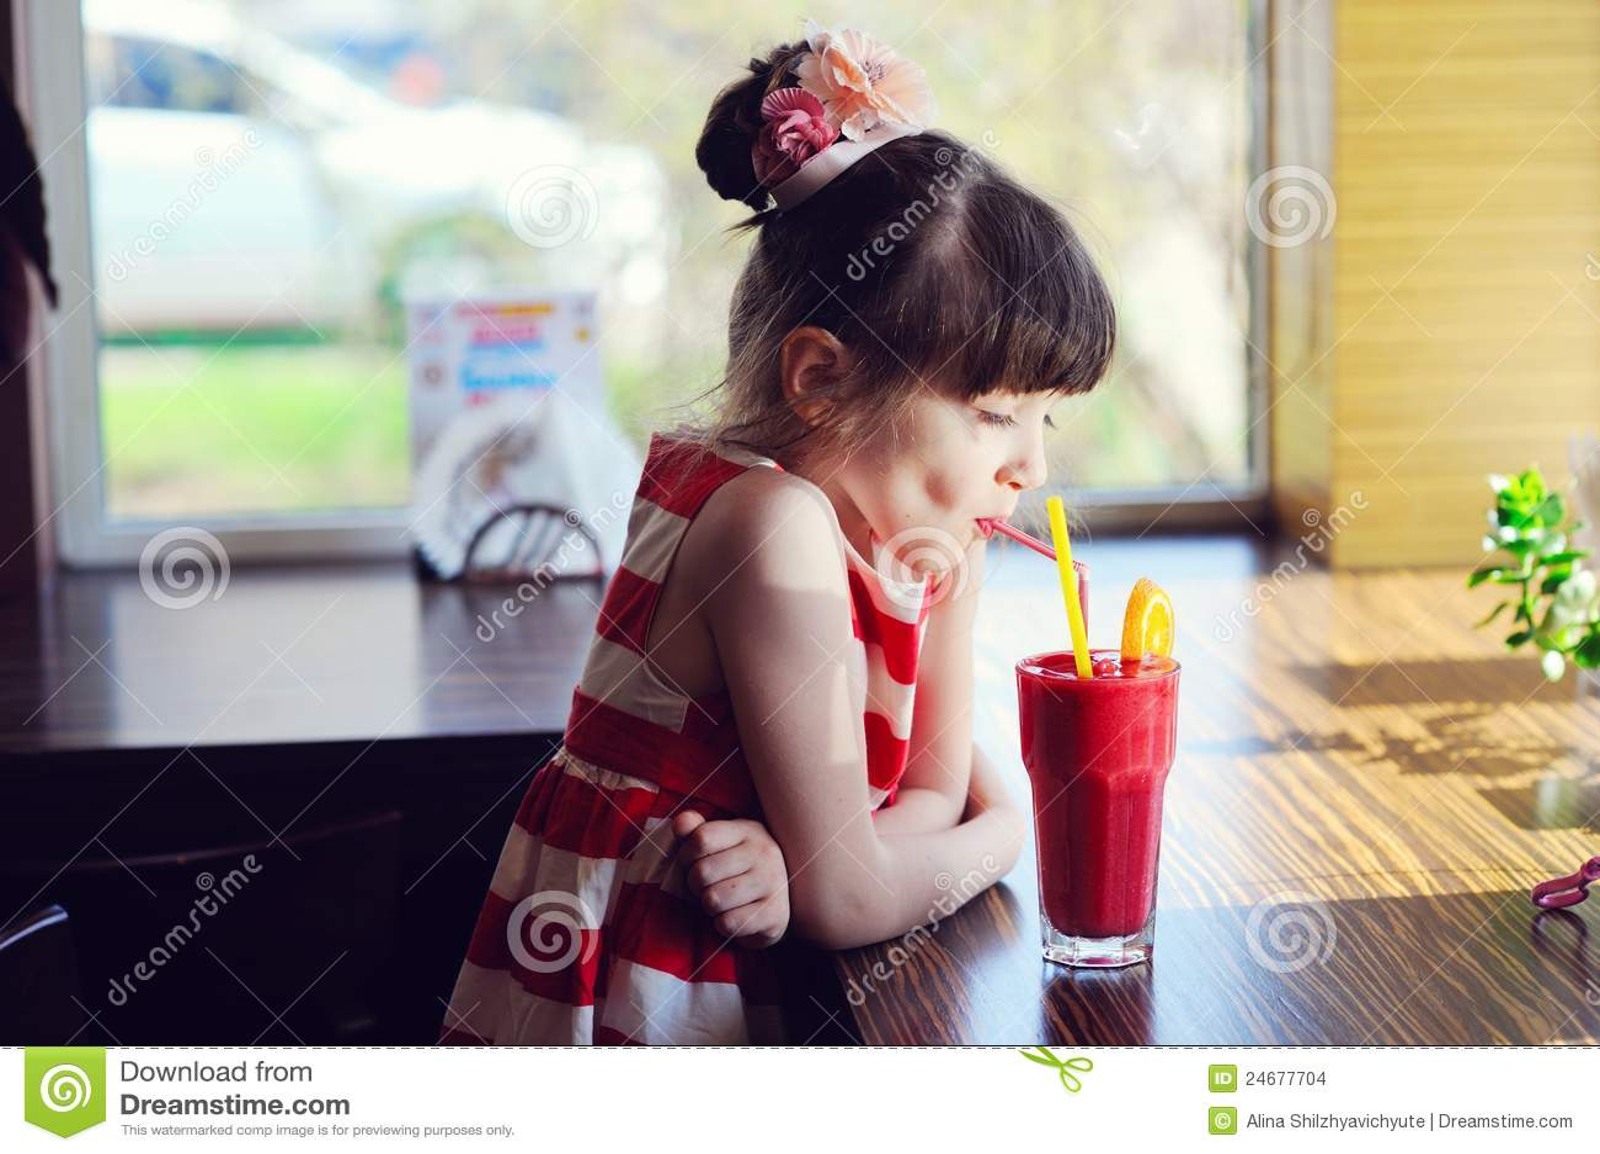 Child Girl Drinking Strawberry Smoothie Stock Photo